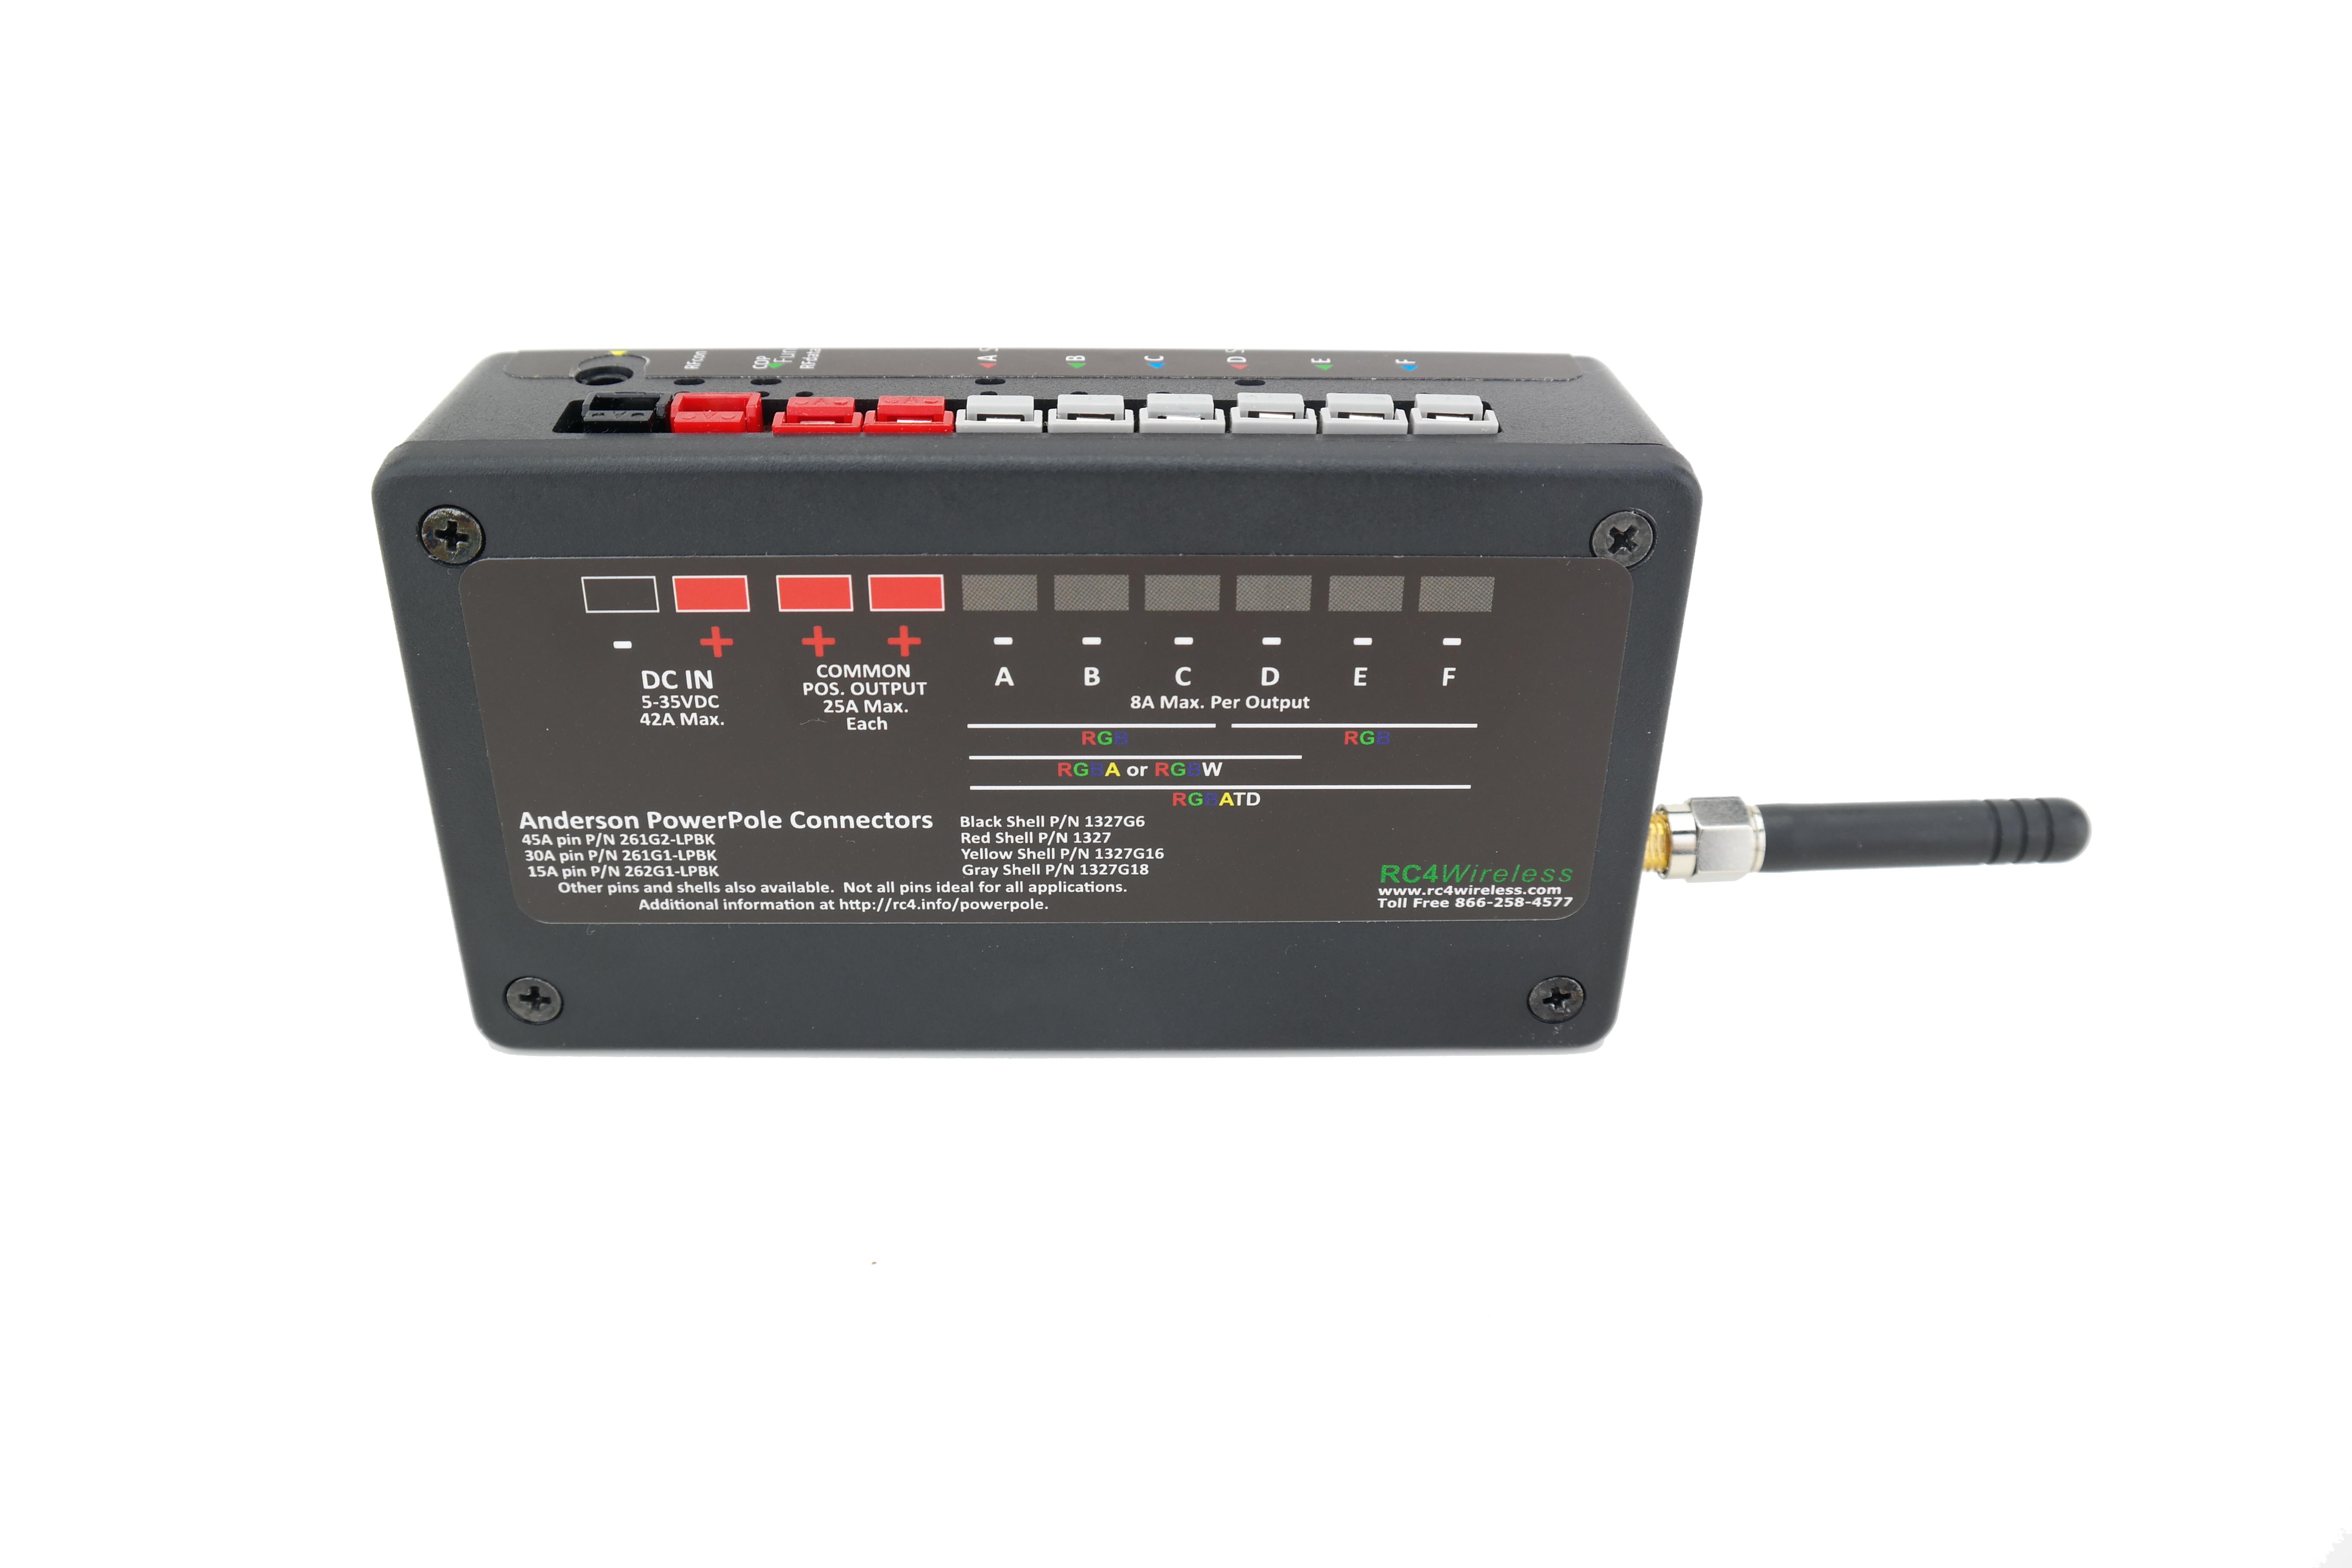 RC4Magic S3 DMX6dim-500 High Power 6-Channel Wireless Dimmer